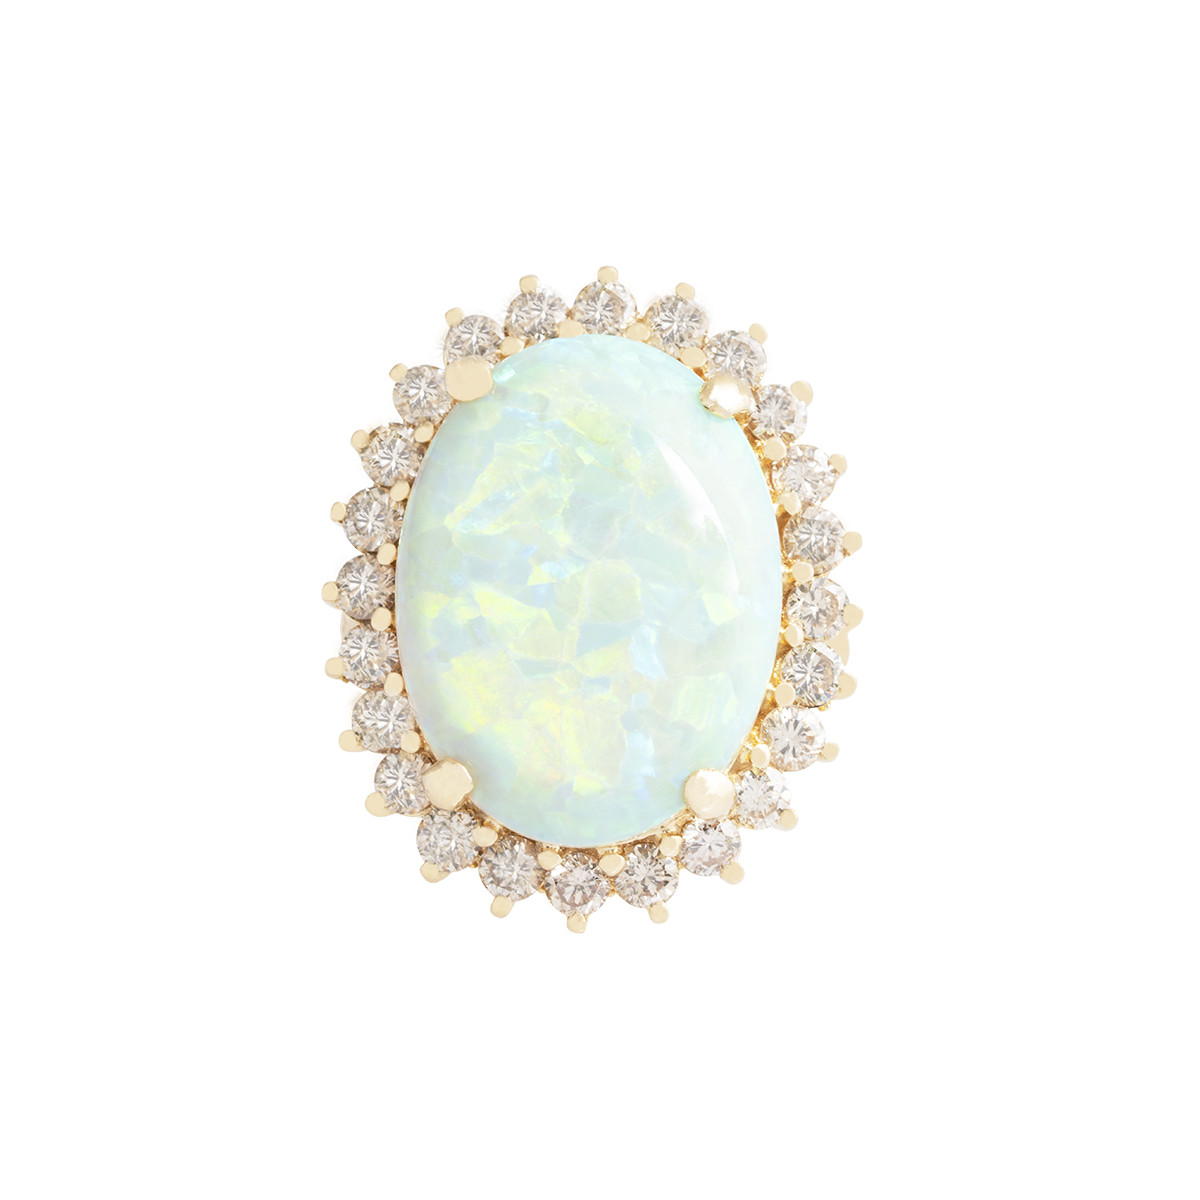 Vintage 8.32 CTW Opal & Diamond Halo Ring